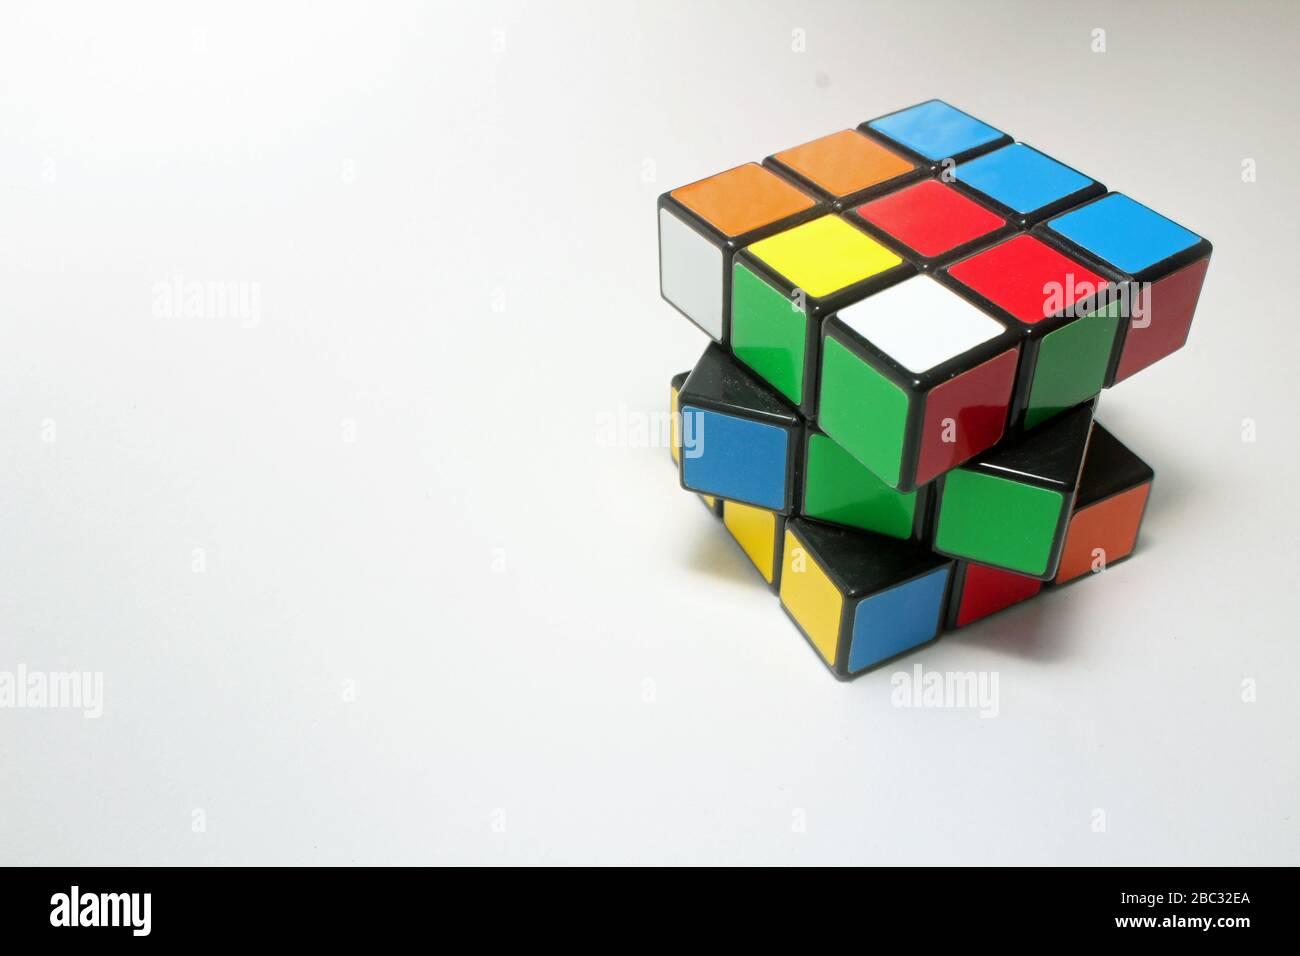 Cubo de Rubik Puzzle clásico de cubo de Rubik de 3x3x3 multicolor Foto de stock